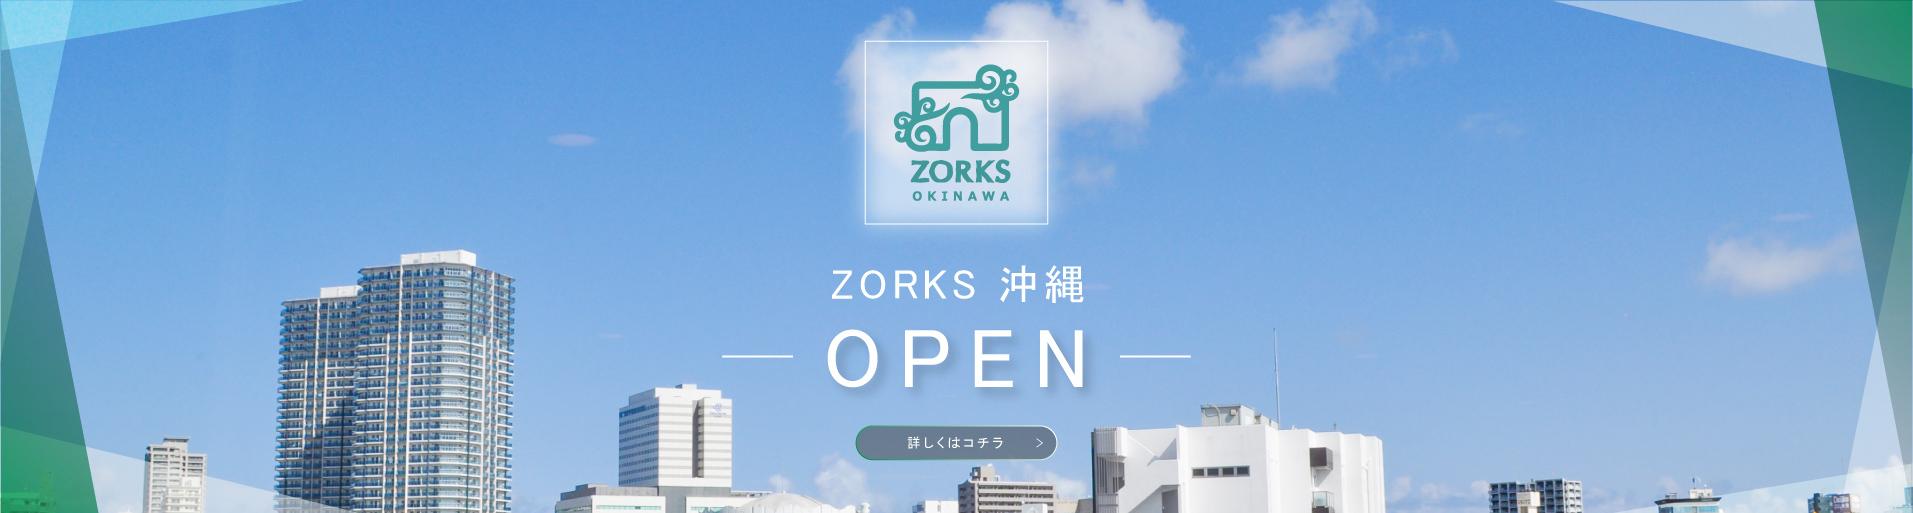 ZORKS沖縄